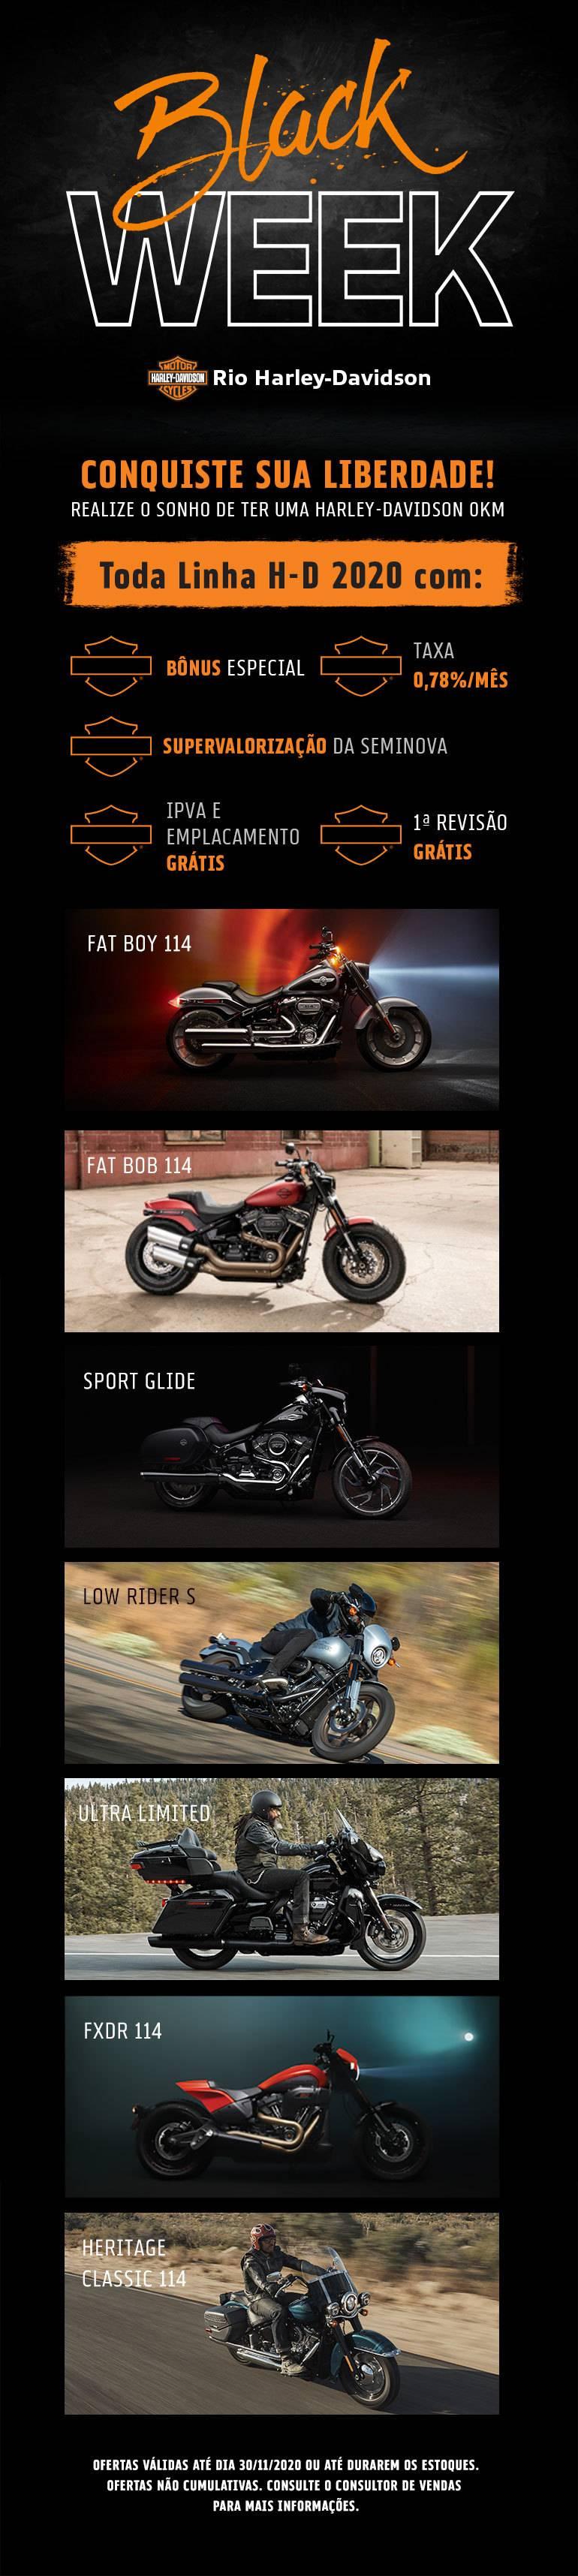 Black Week Harley-Davidson